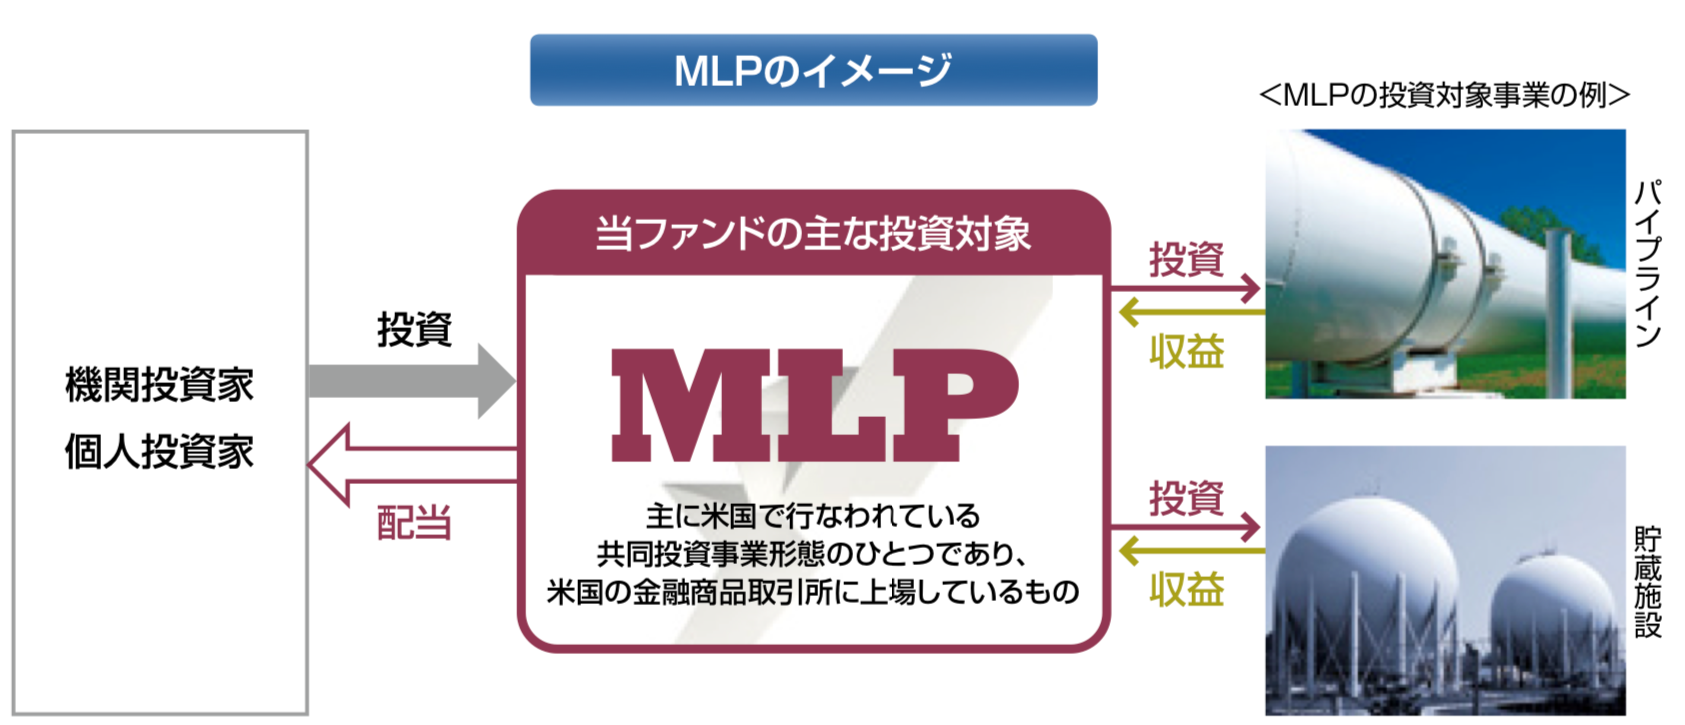 MLPの仕組み